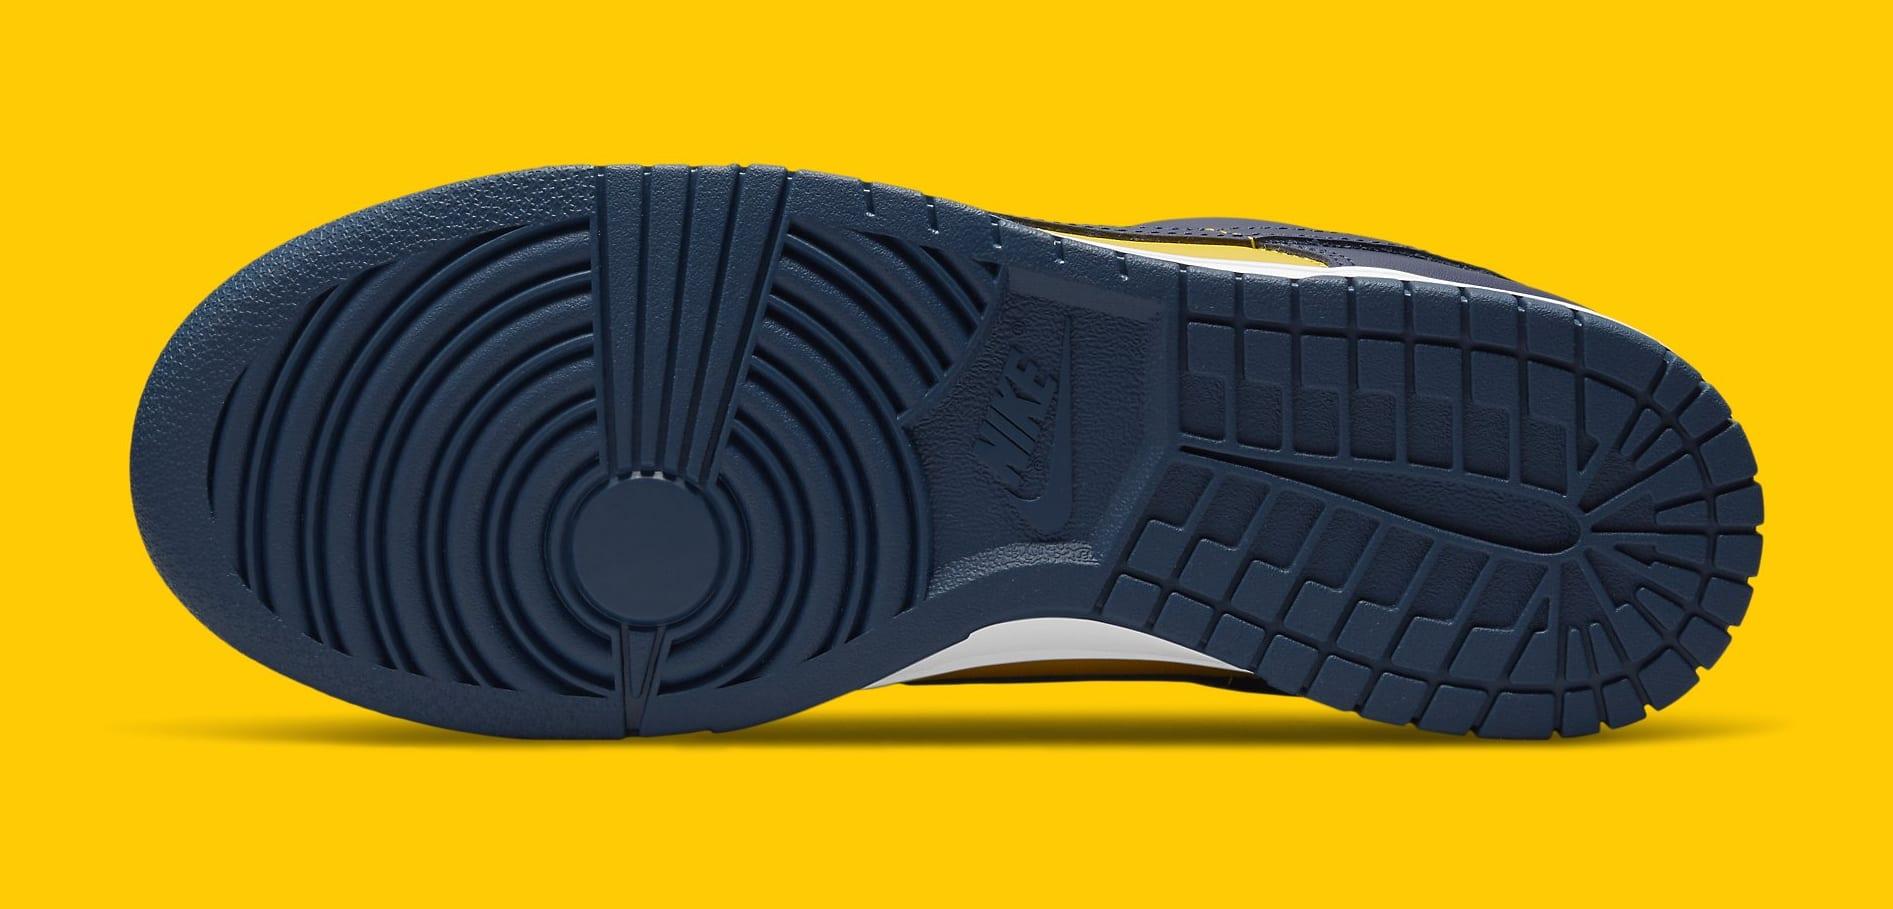 Nike Dunk Low 'Michigan' 2021 DD1391-700 Outsole